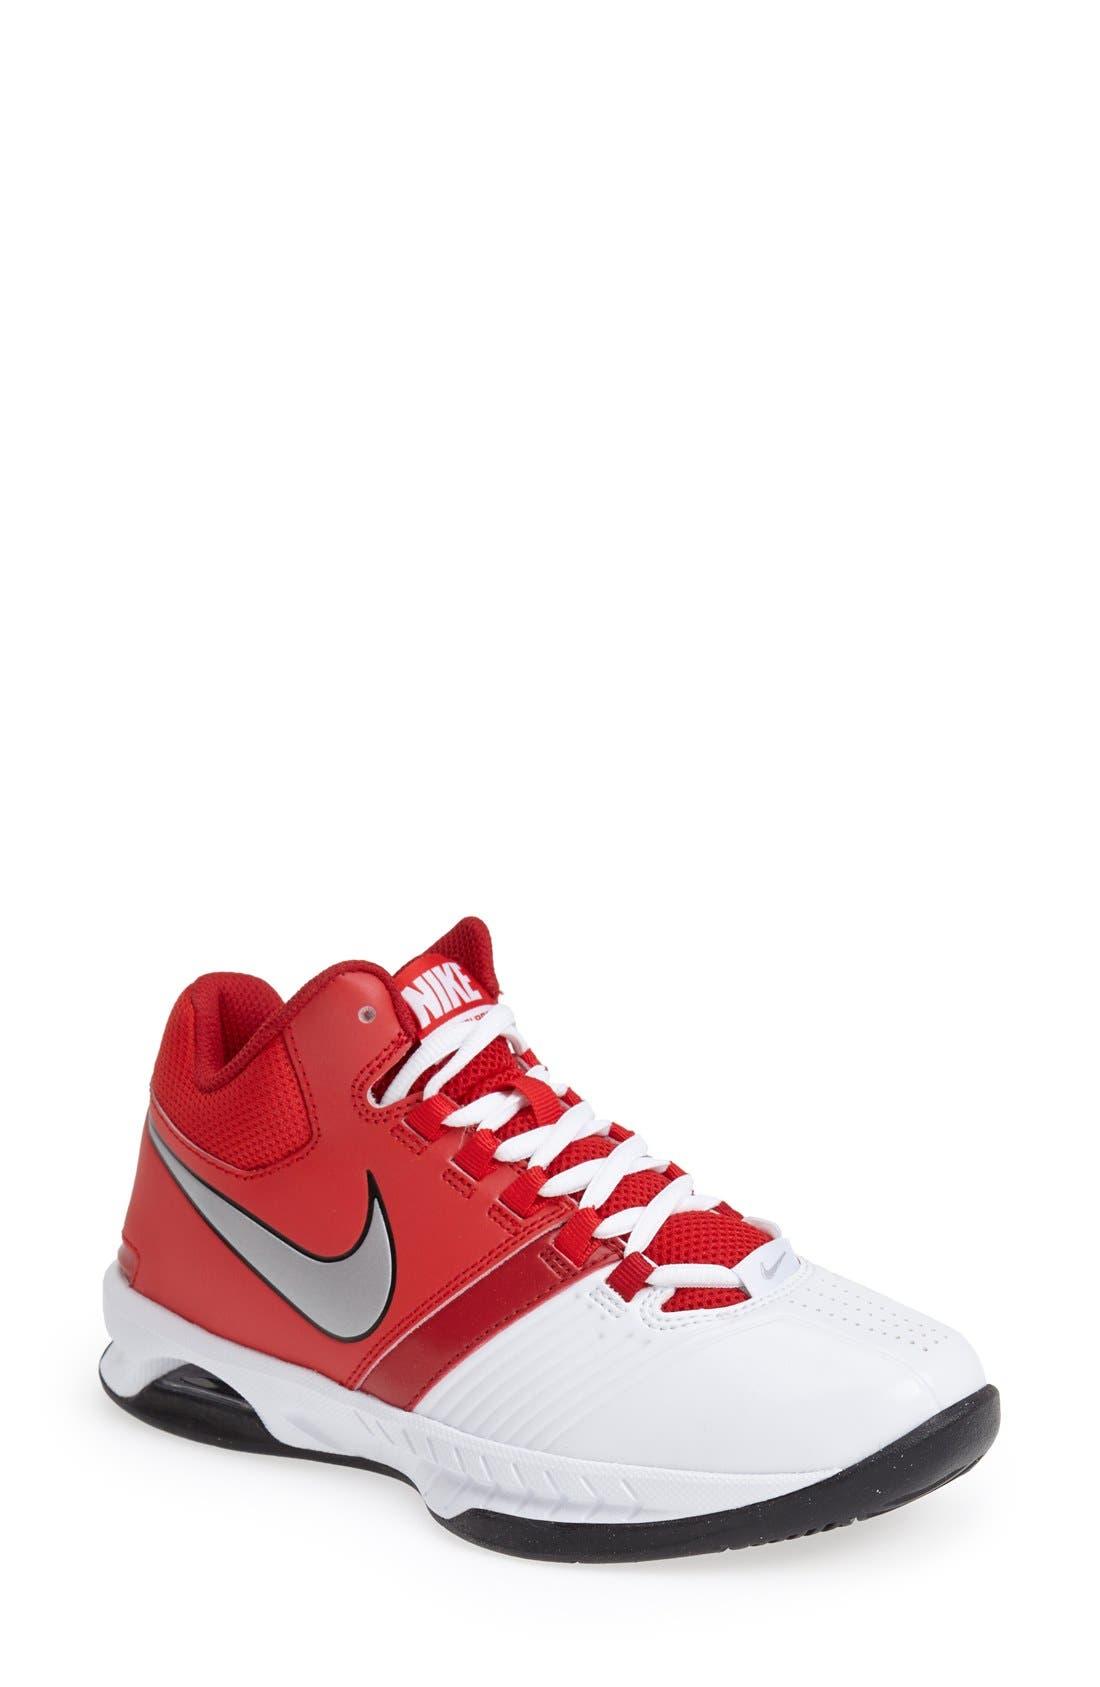 Main Image - Nike 'Air Visi Pro V' Basketball Shoe (Women)